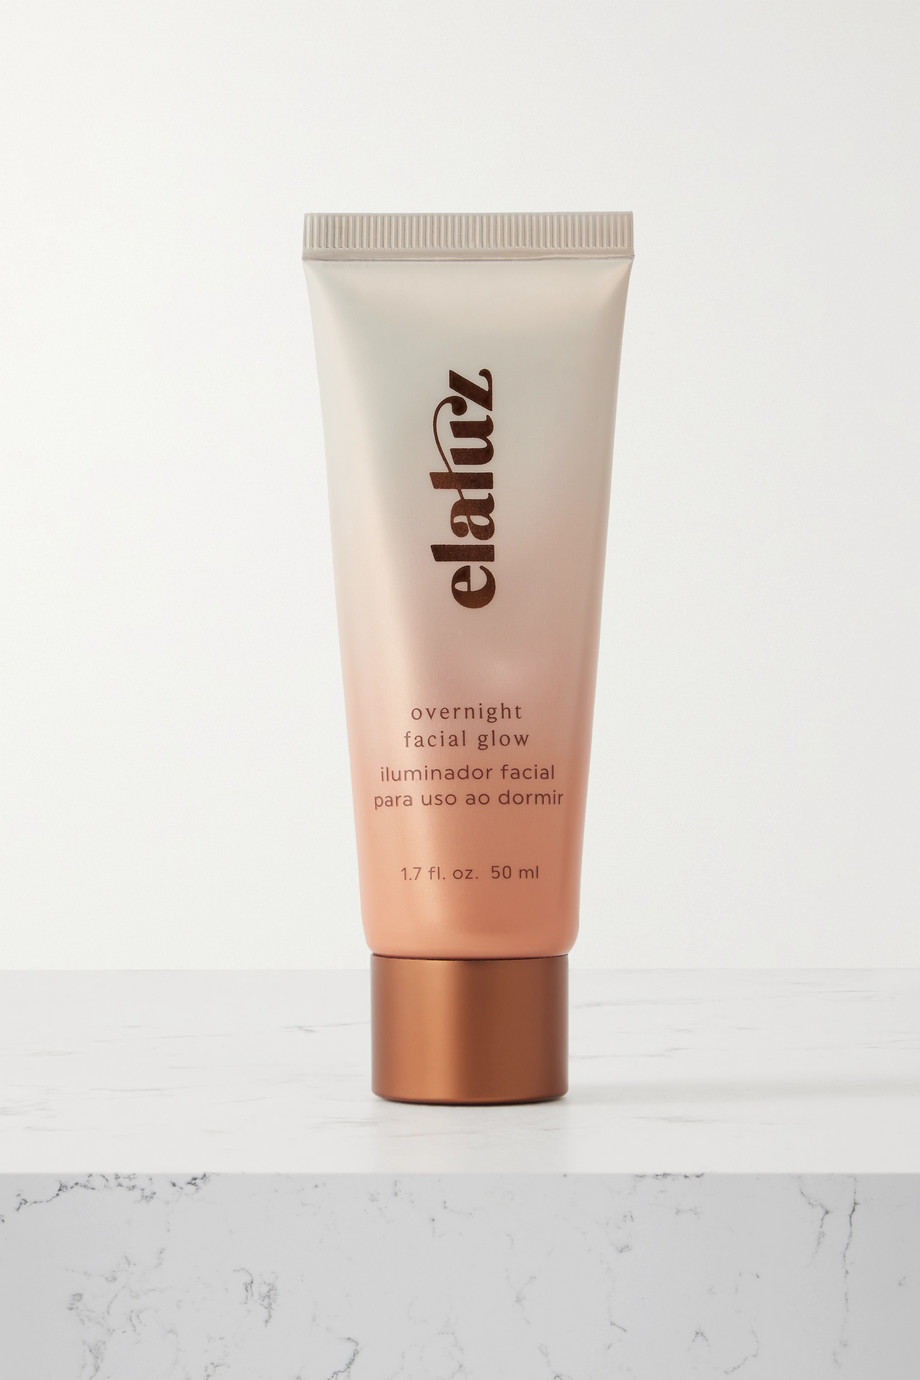 Elaluz Overnight Facial Glow, 50 ml – Bräunungscreme